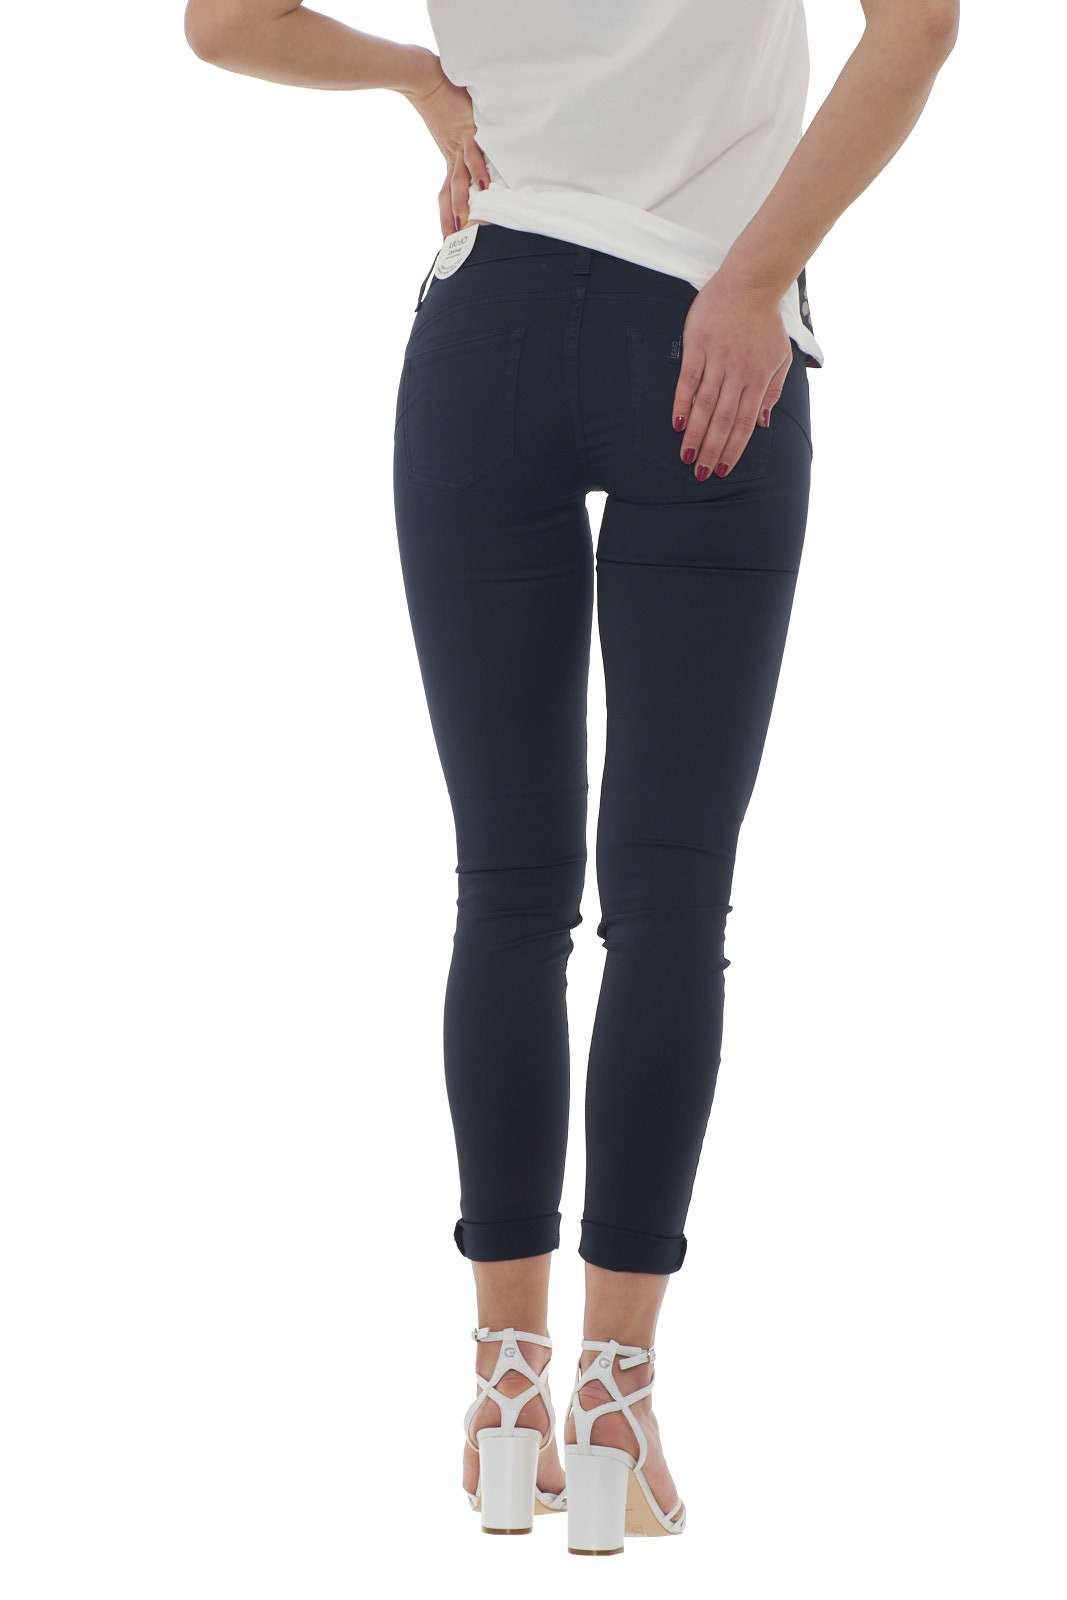 https://www.parmax.com/media/catalog/product/a/i/PE-outlet_parmax-pantaloni-donna-Liu-Jo-w17167-C.jpg